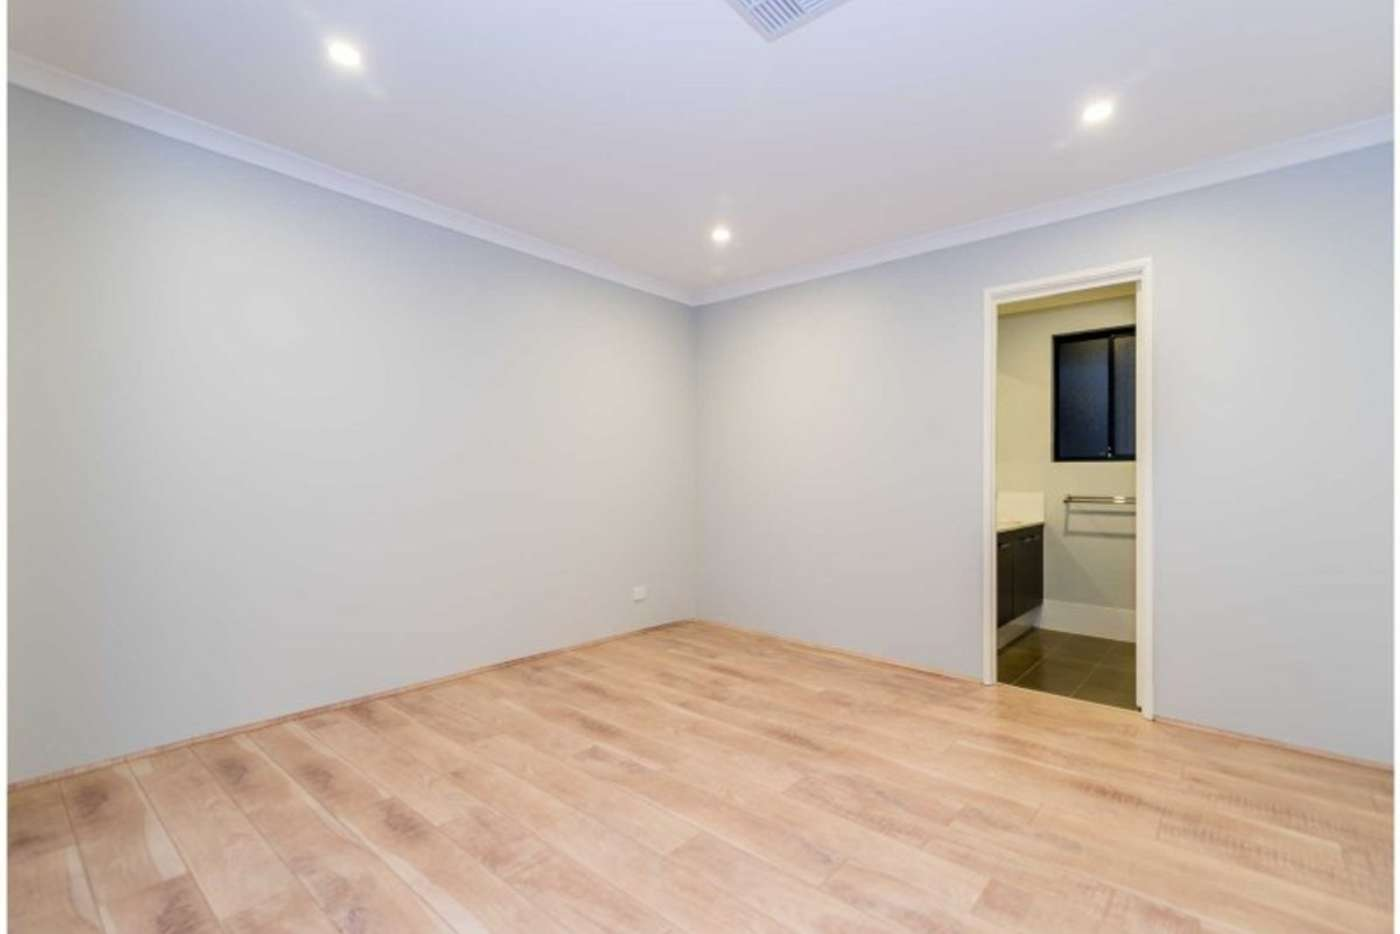 Seventh view of Homely house listing, 59B Helm Street, Maddington WA 6109